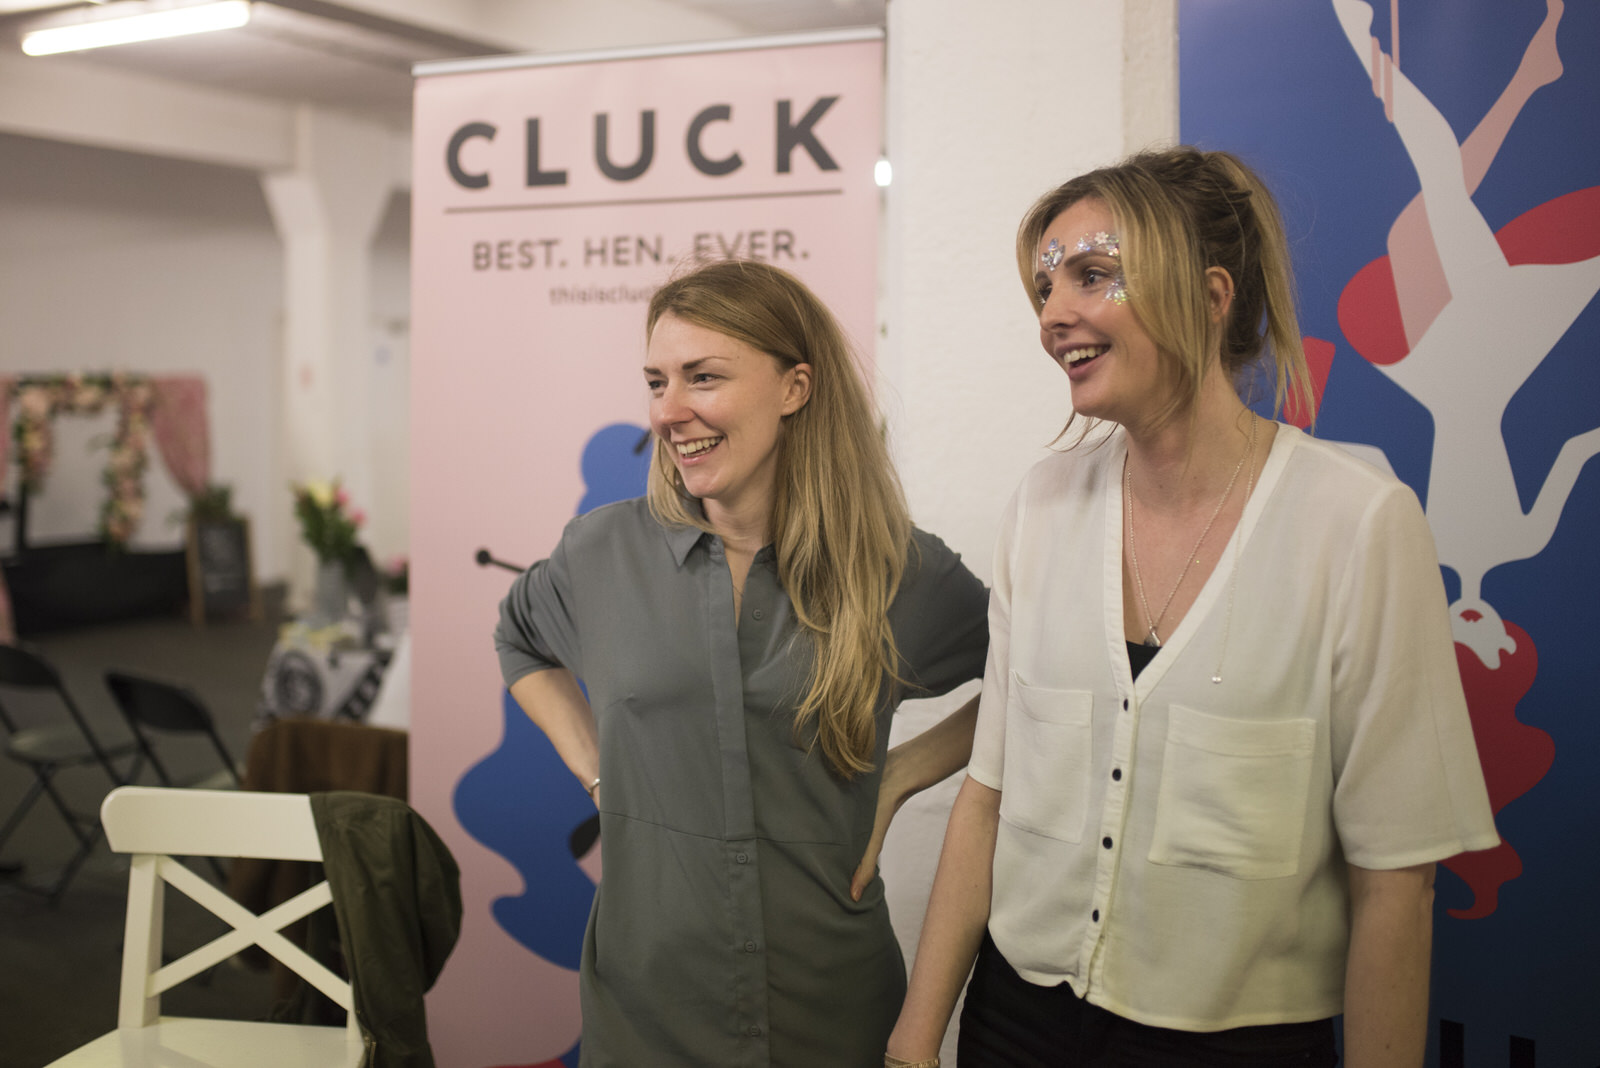 Cluck-86.jpg